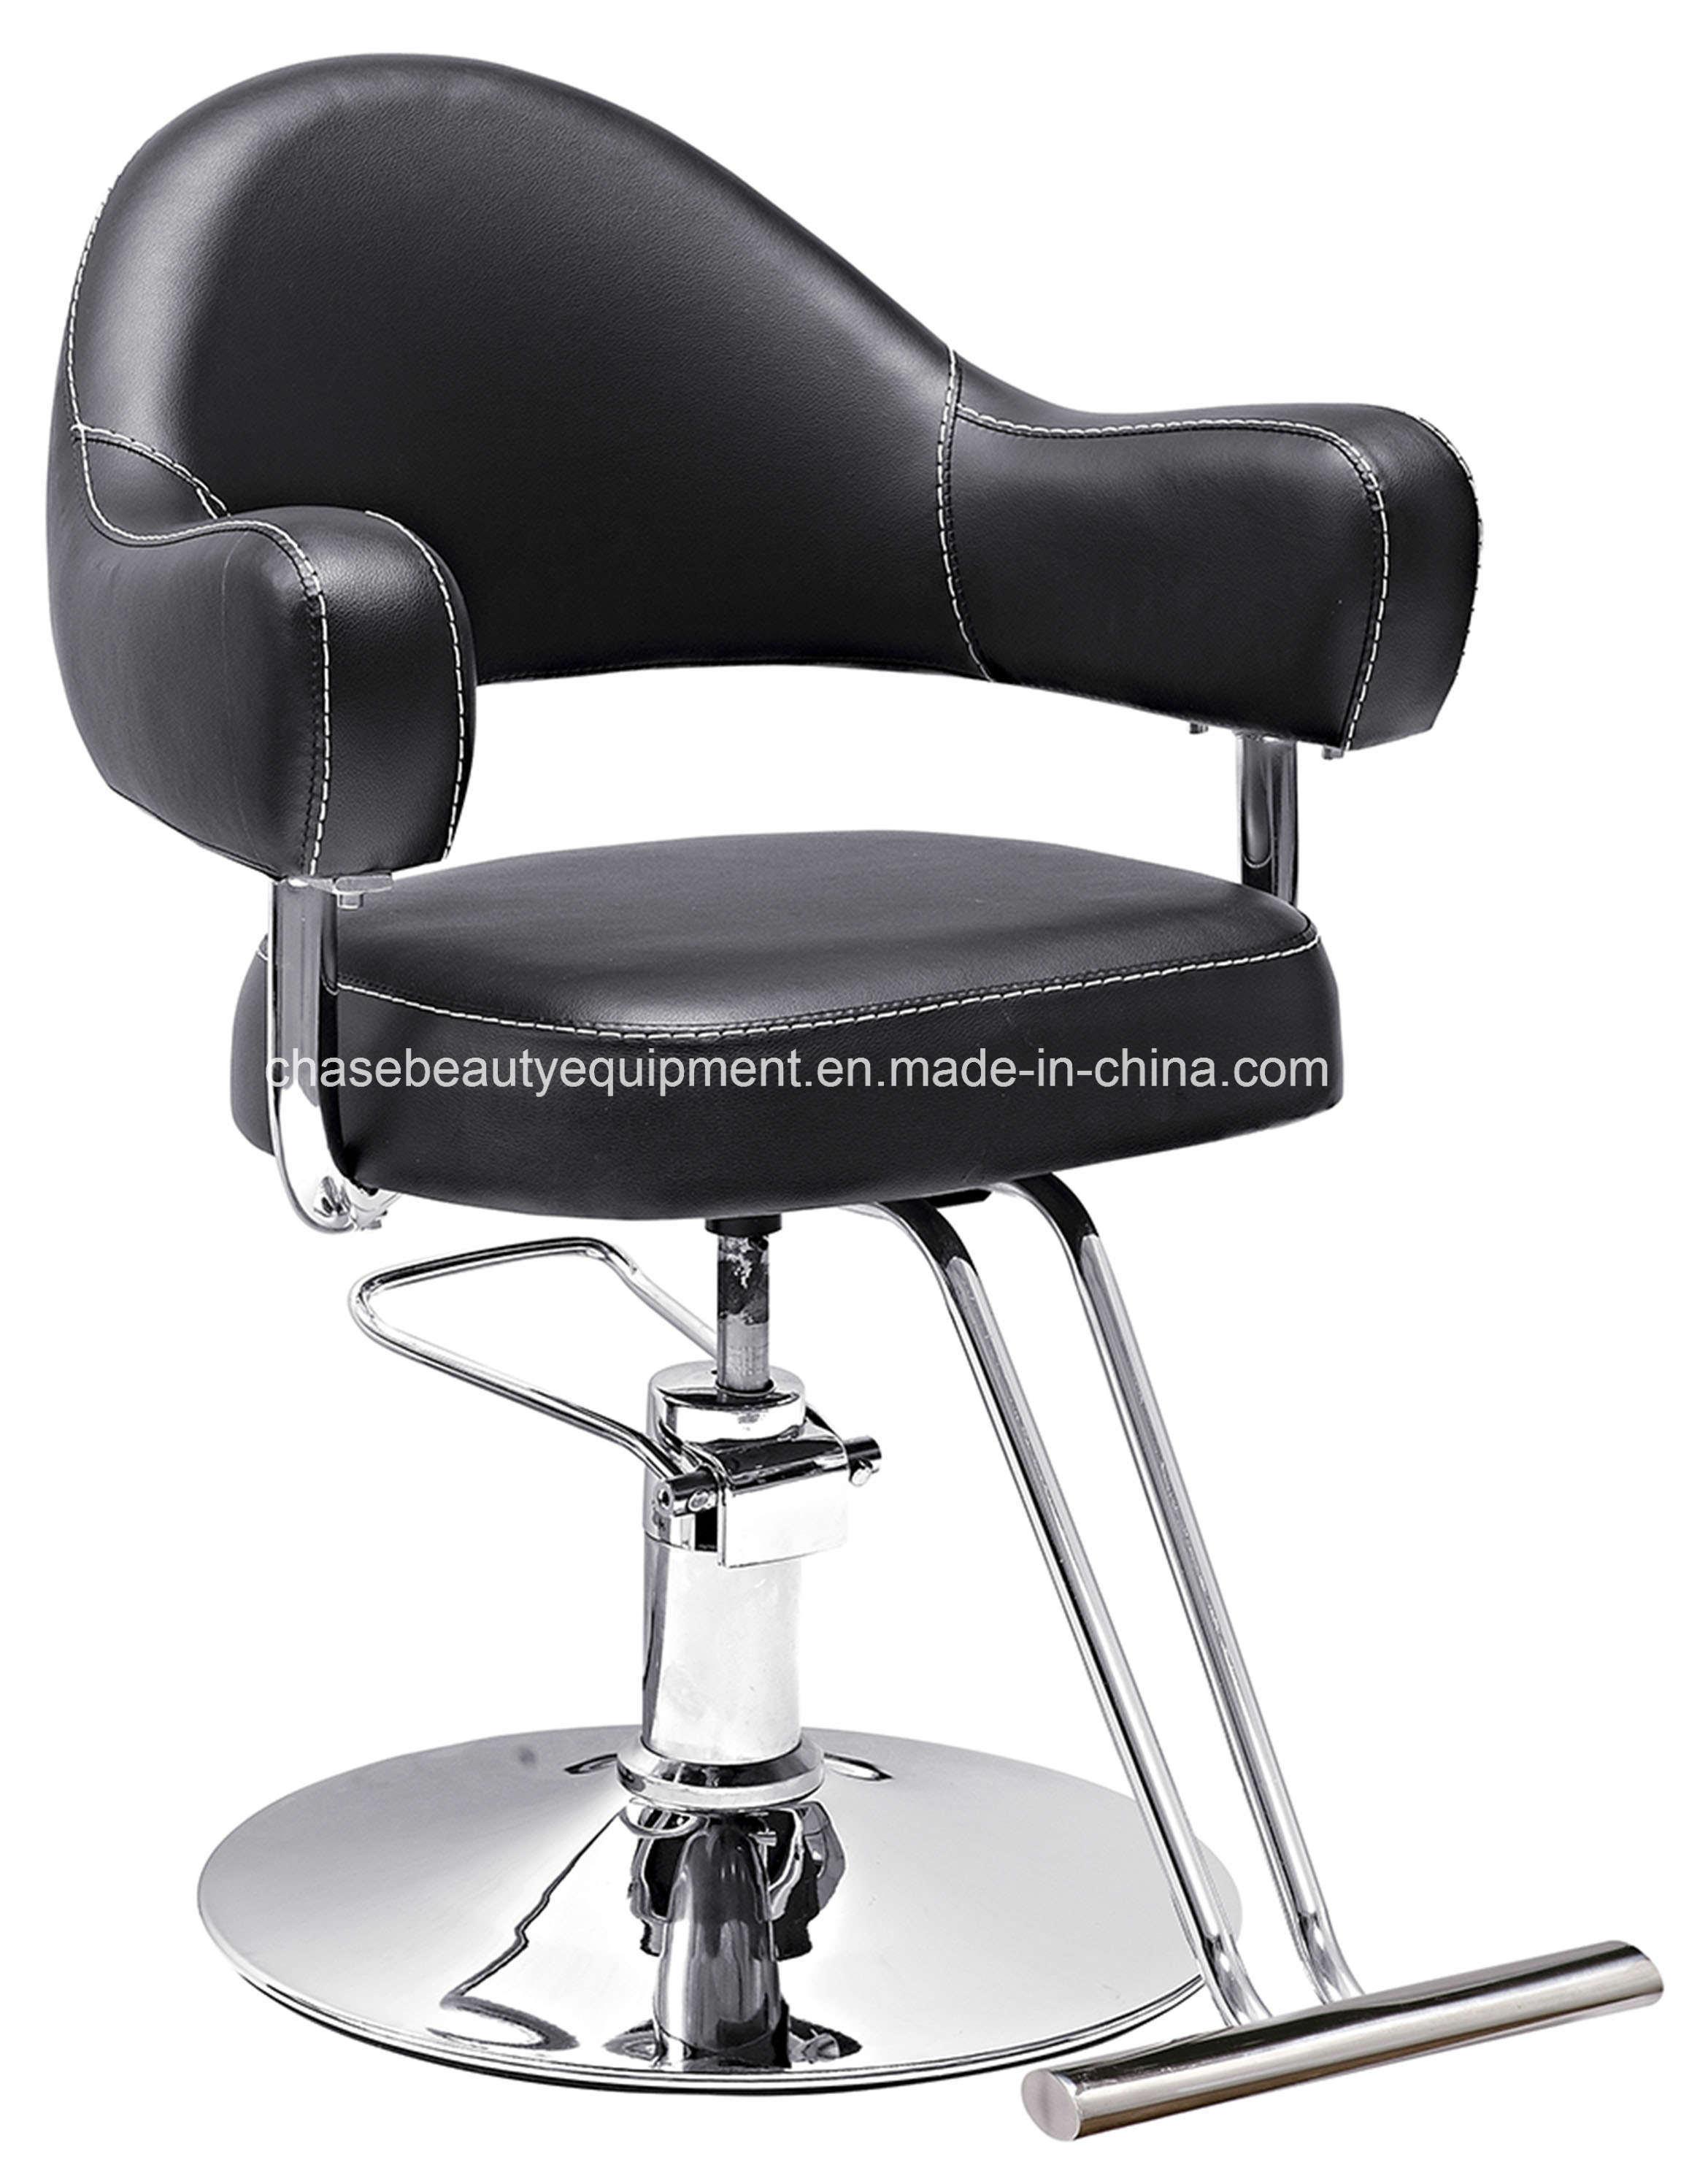 Antique Barber Chair/Reclining Salon Styling Chair/Beauty Salon Furniture